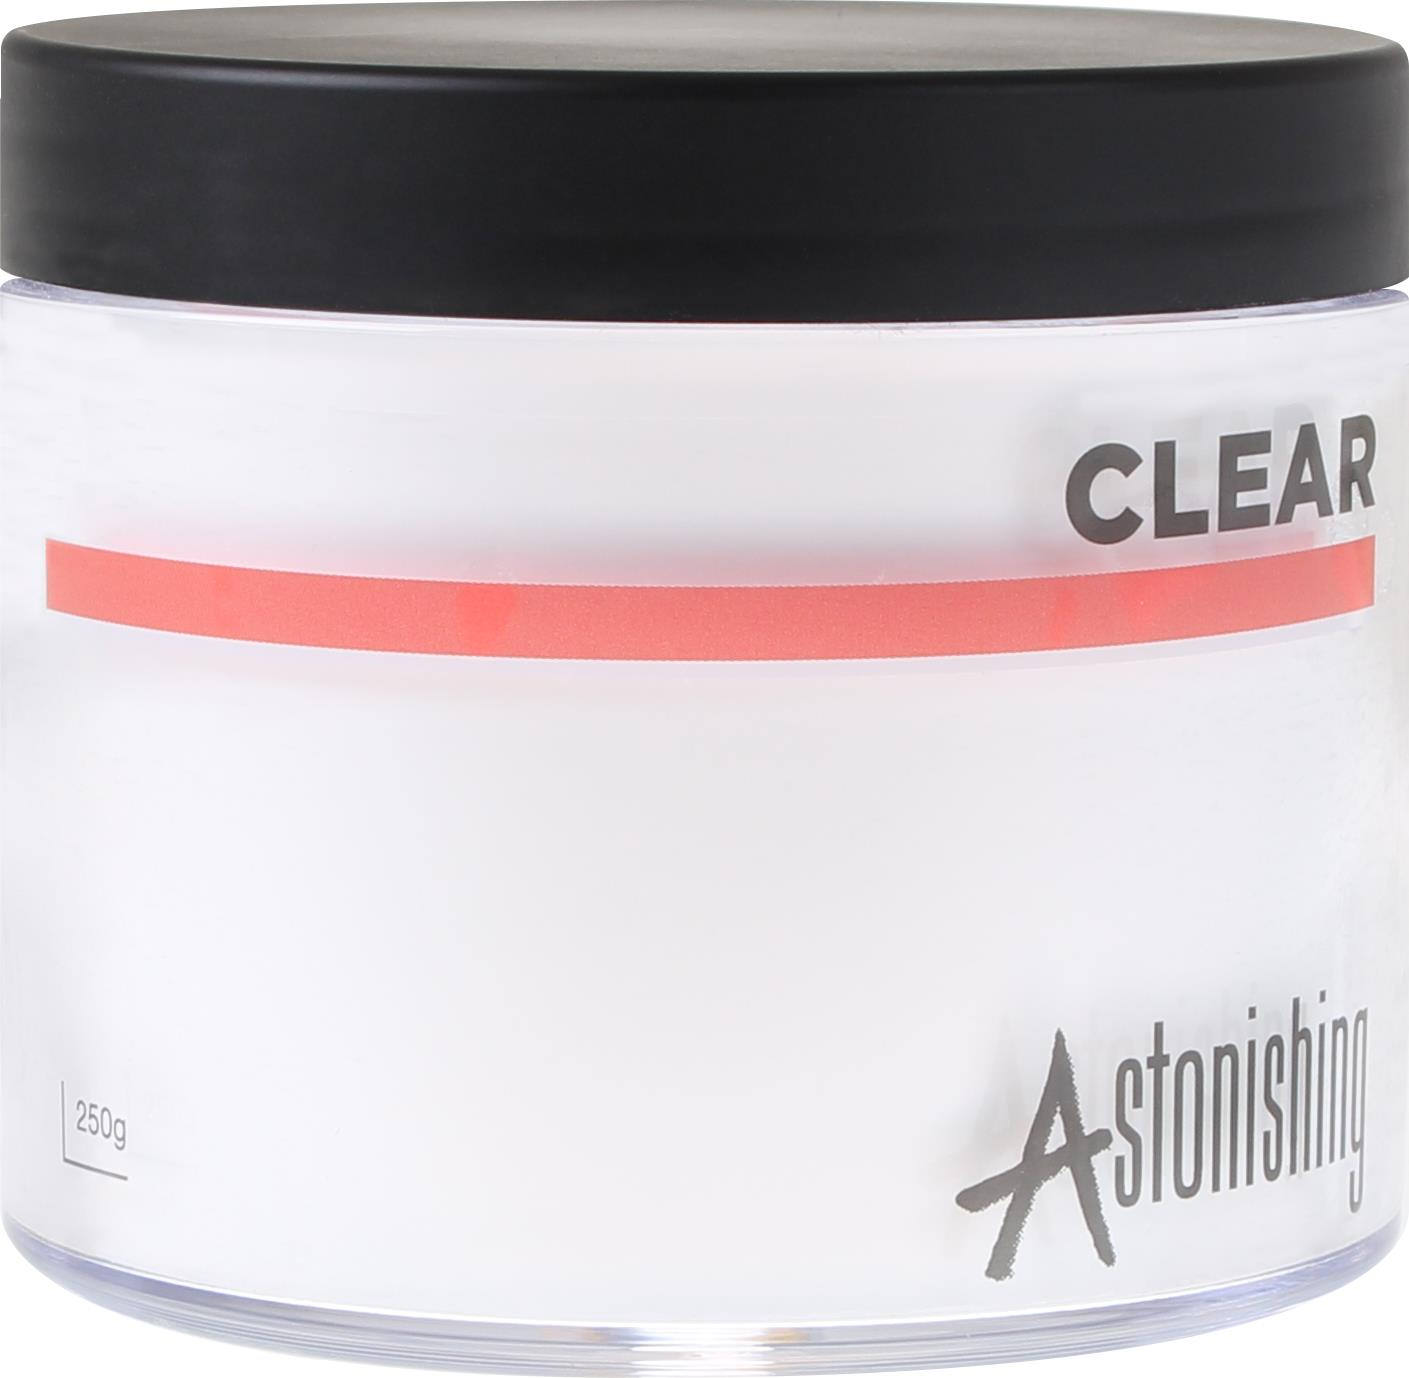 Afbeelding van AST - Acryl Powder Clear 250gr